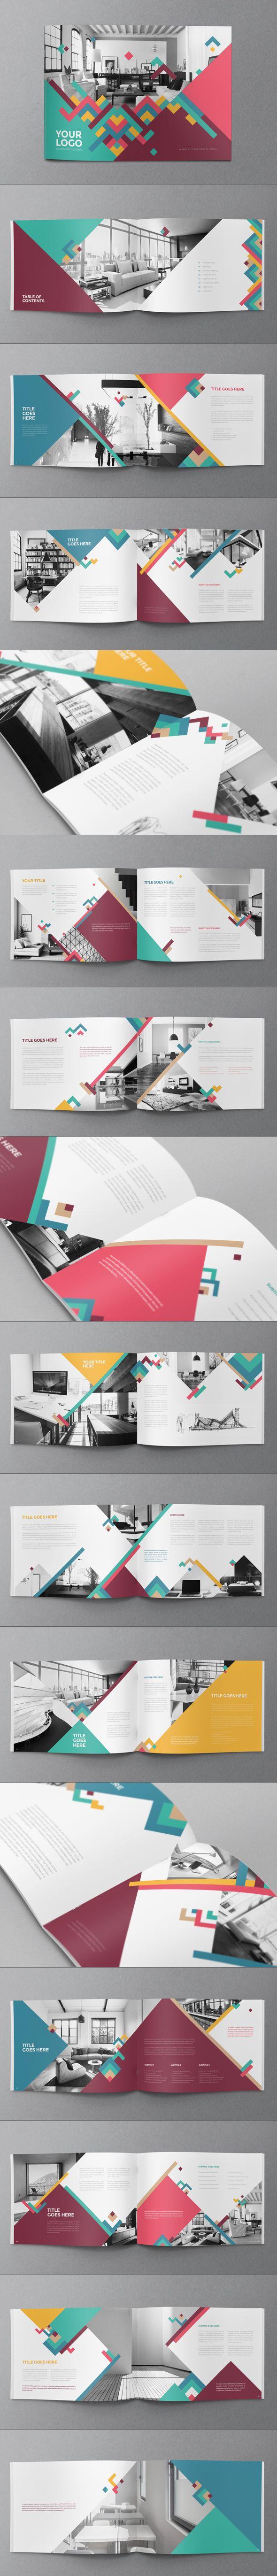 Colorful Pattern Brochure 2 by Abra Design, via Behance